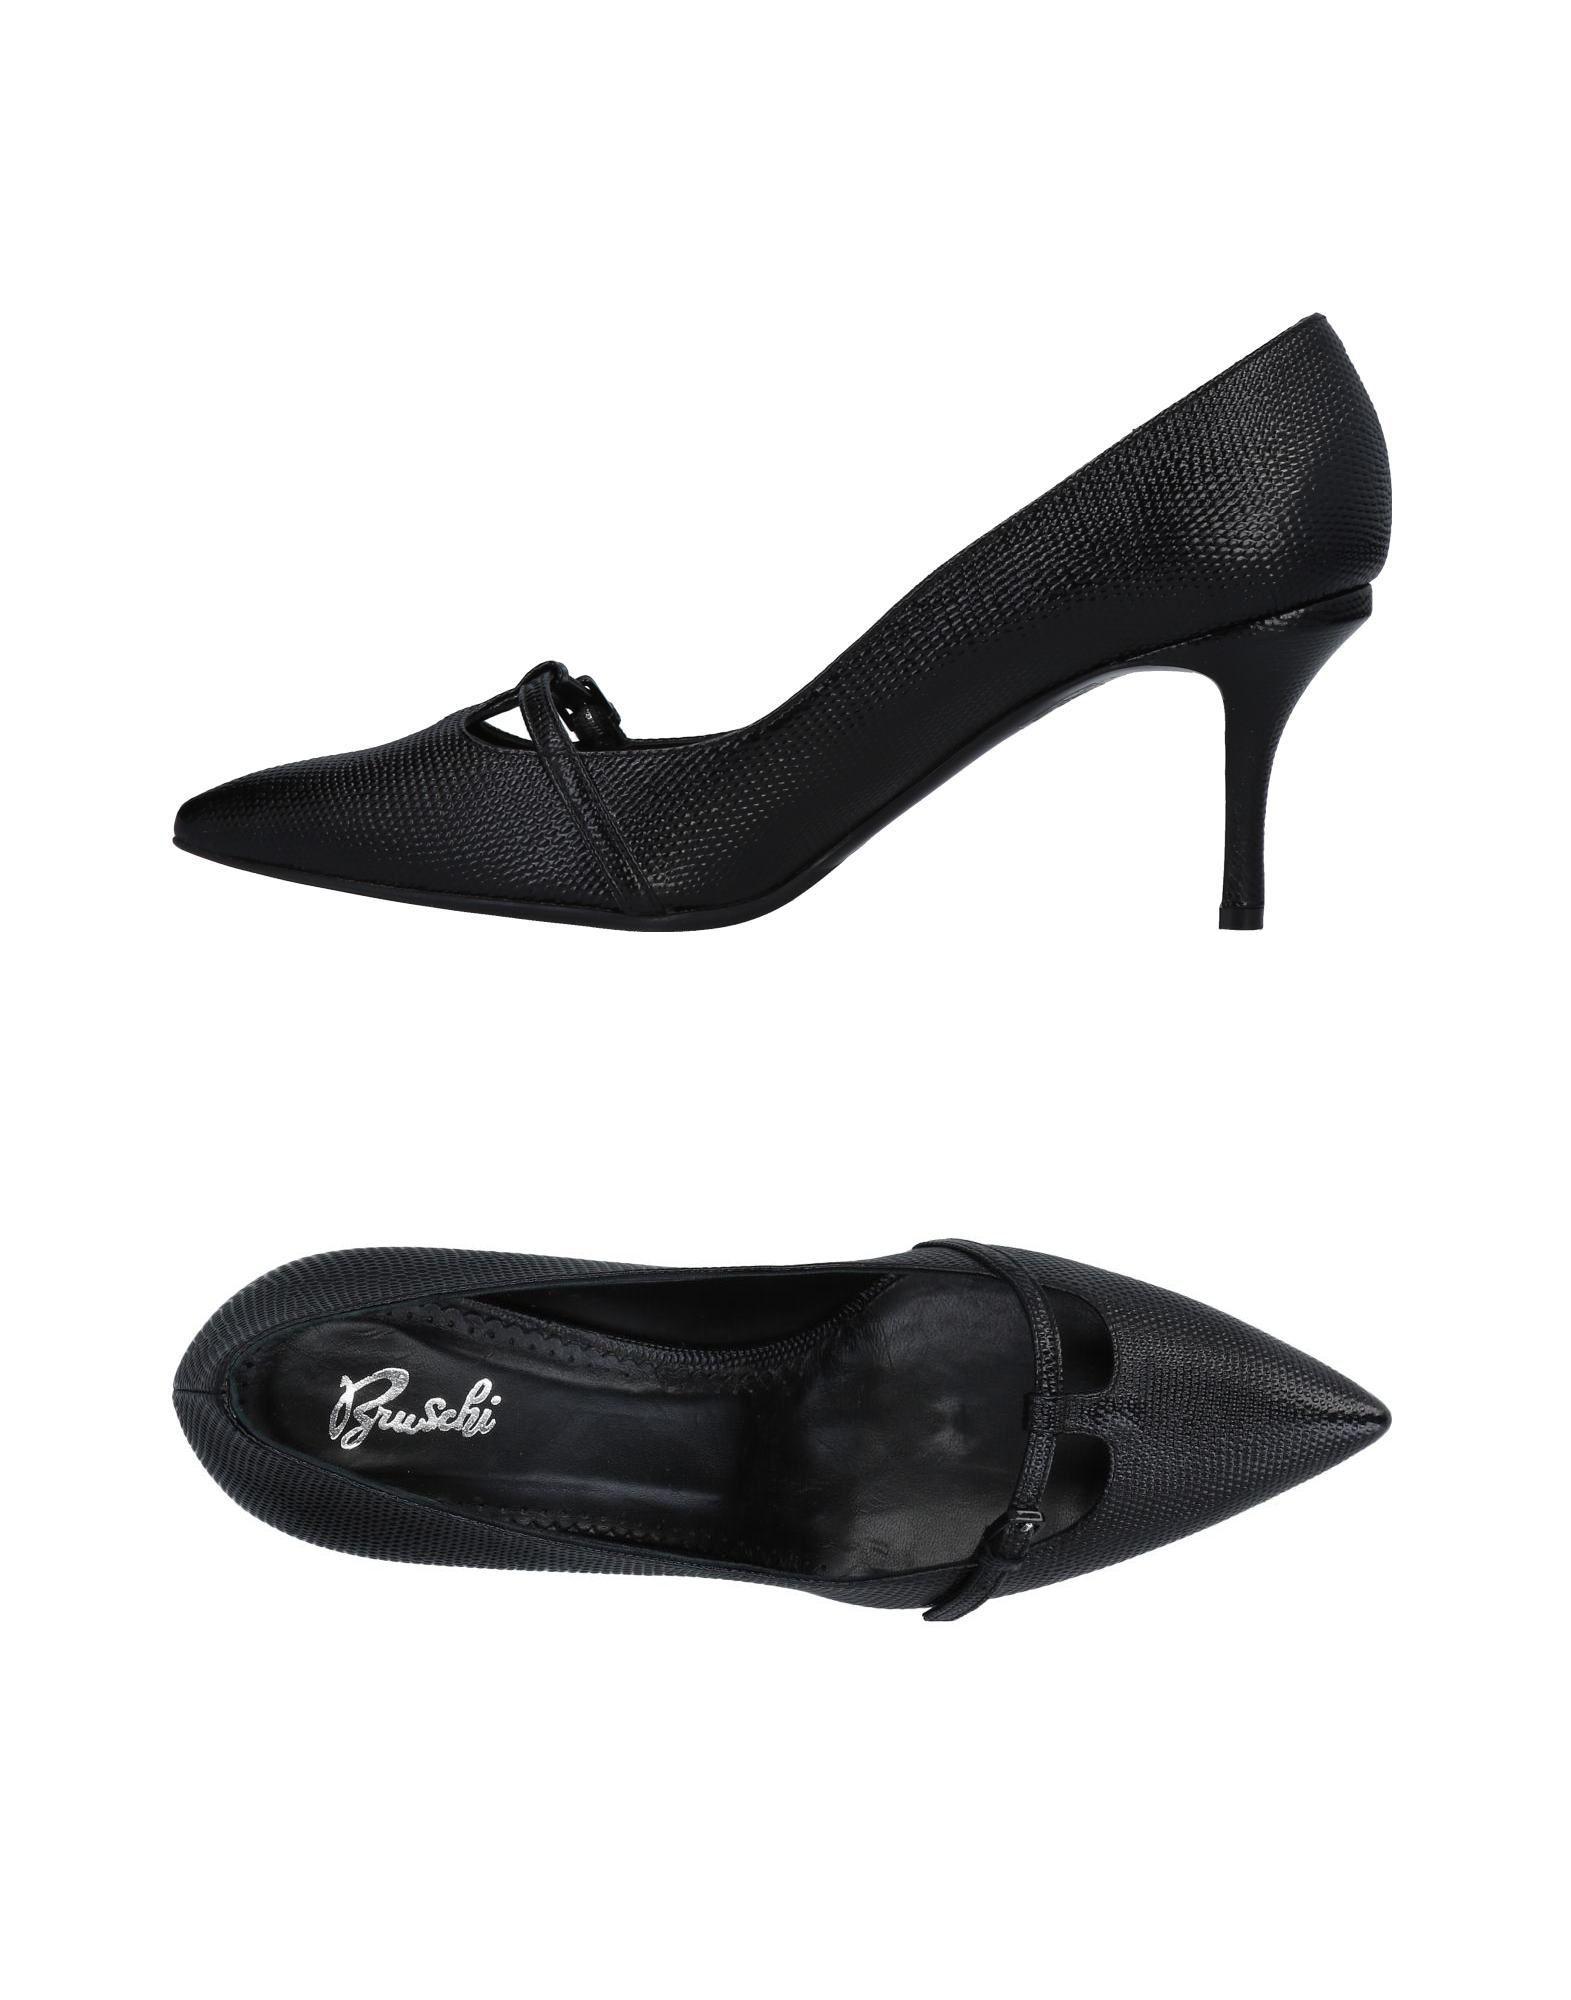 Haltbare Mode billige Schuhe Bruschi Pumps Damen  11483490SH Heiße Schuhe